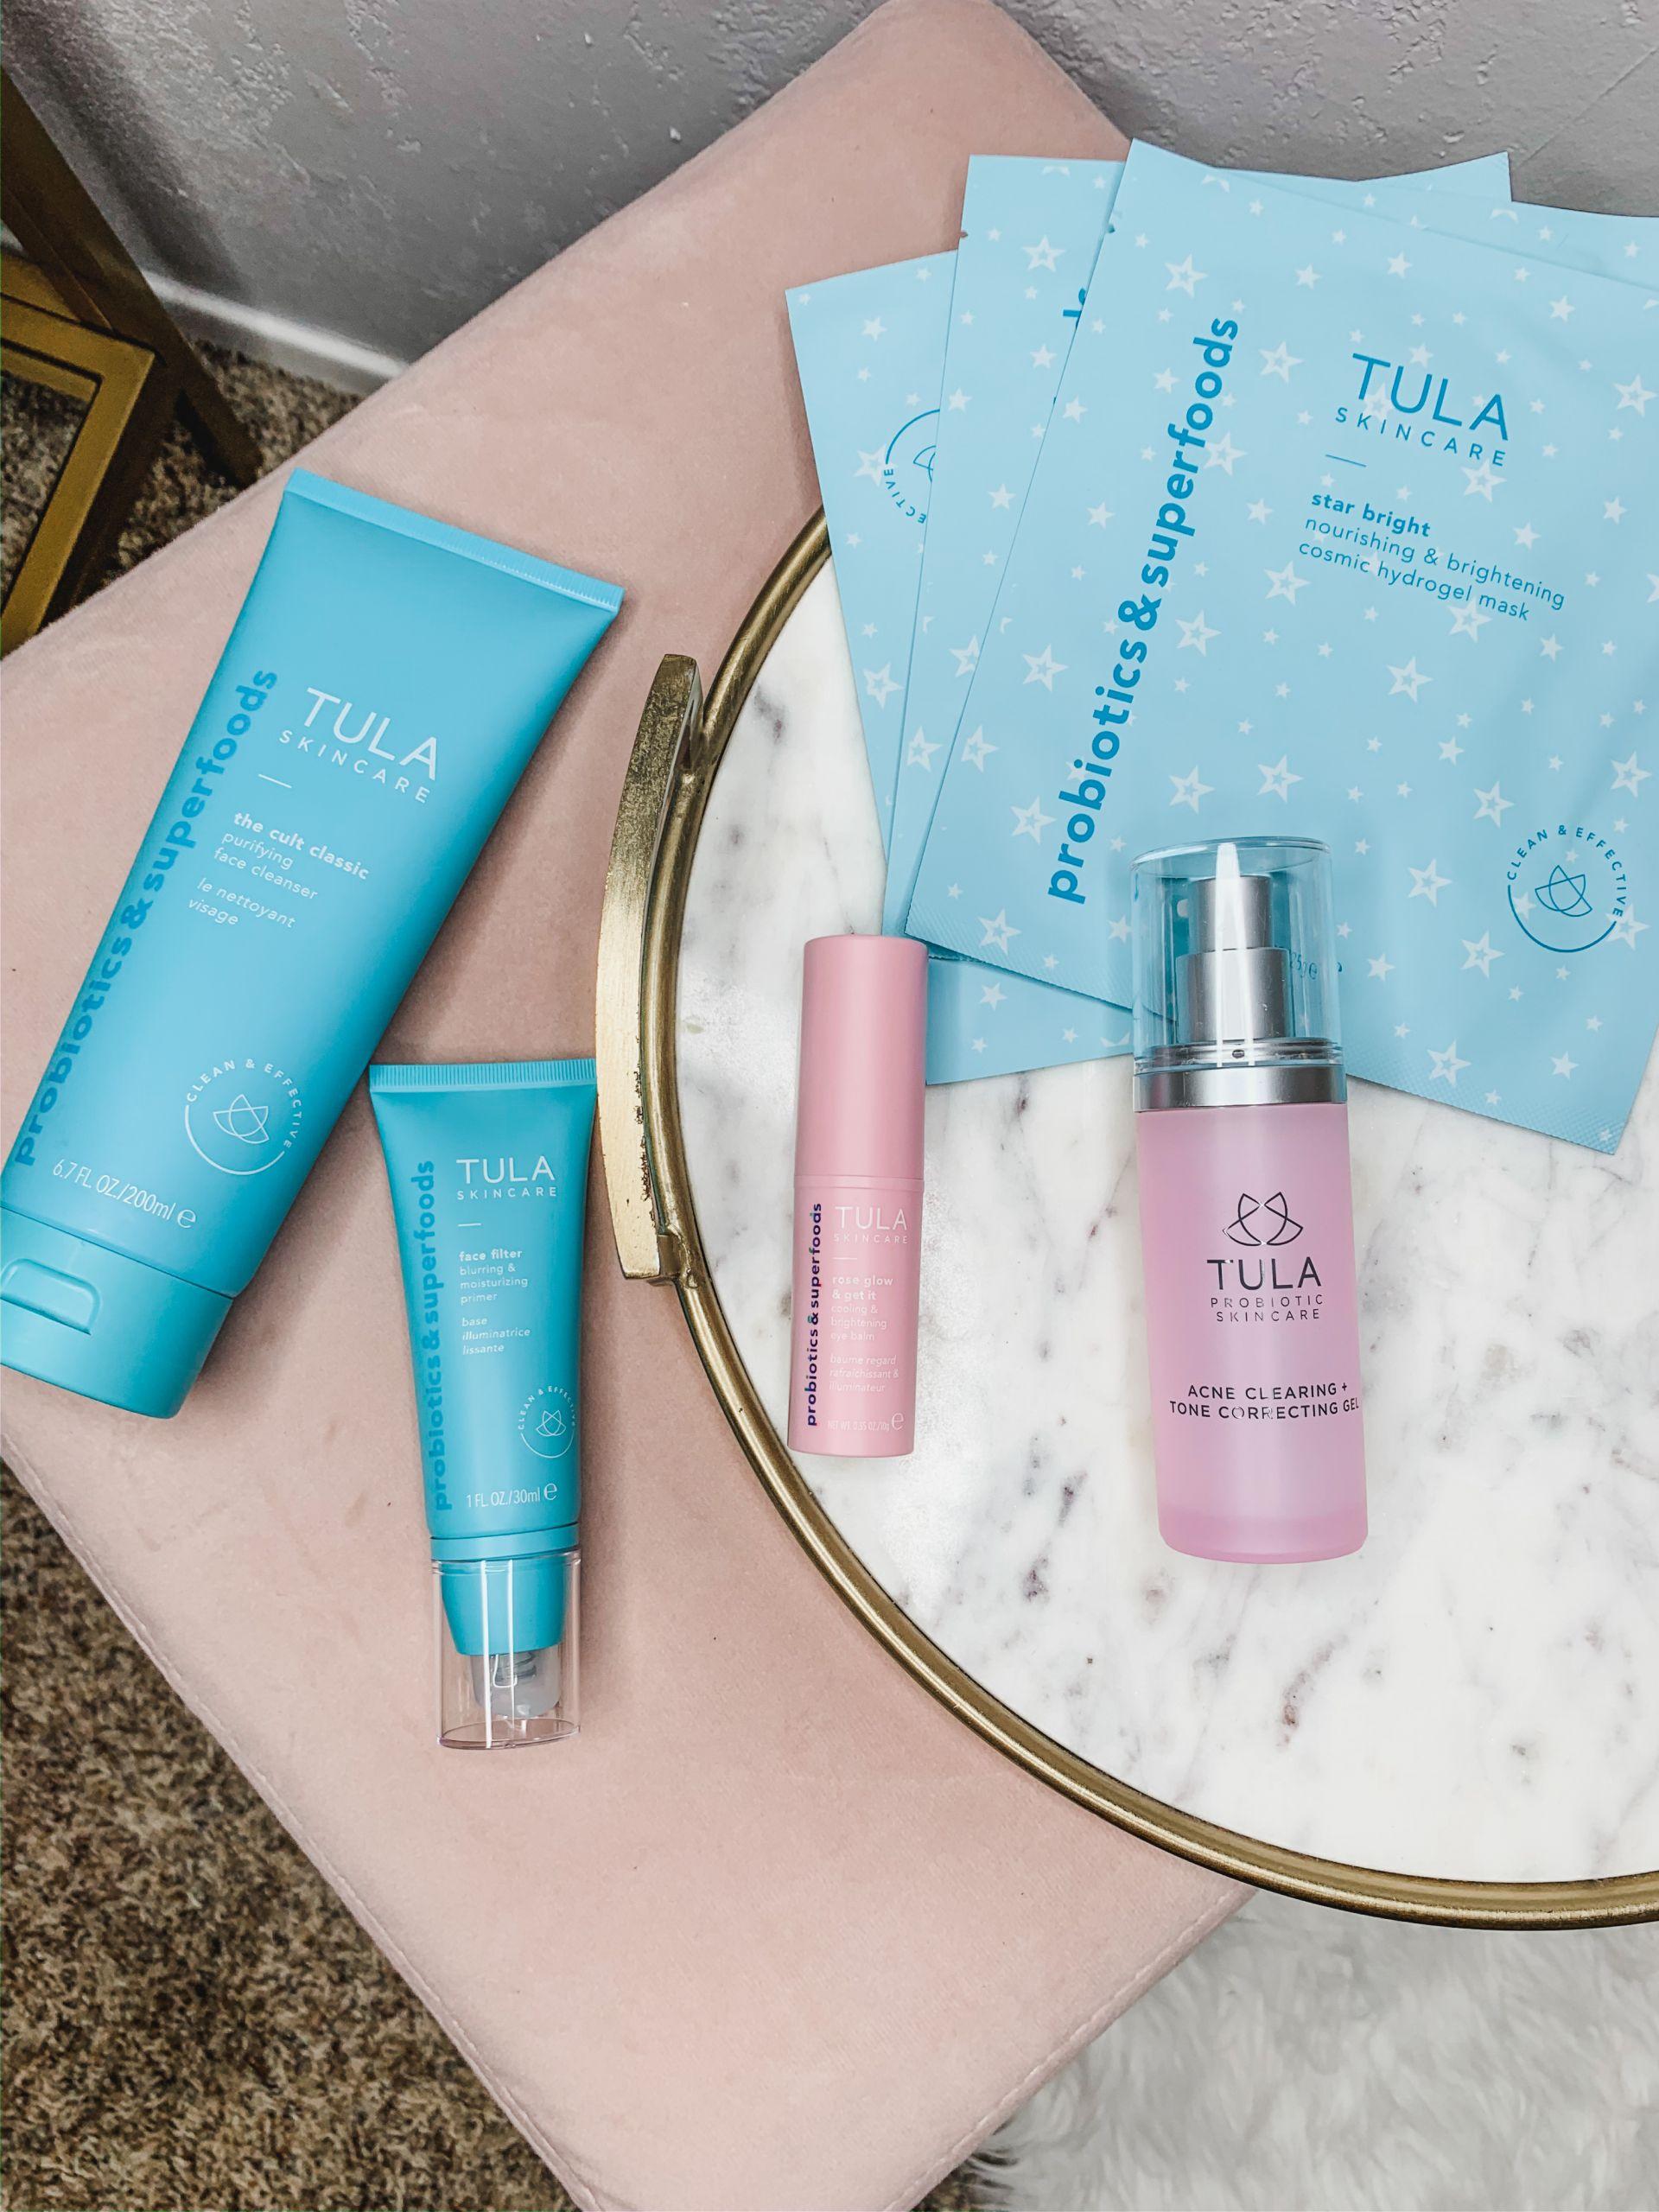 Top 5 Tula Skincare Products // Affordable Skincare Products // Skincare Routine // Skincare for All Skin Types // Probiotic Skincare // Cruelty-Free Skincare // Natural Skincare Products // Skincare Tips & Tricks   Beauty With Lily #tulaskincare #cruelyfree #skincaretips